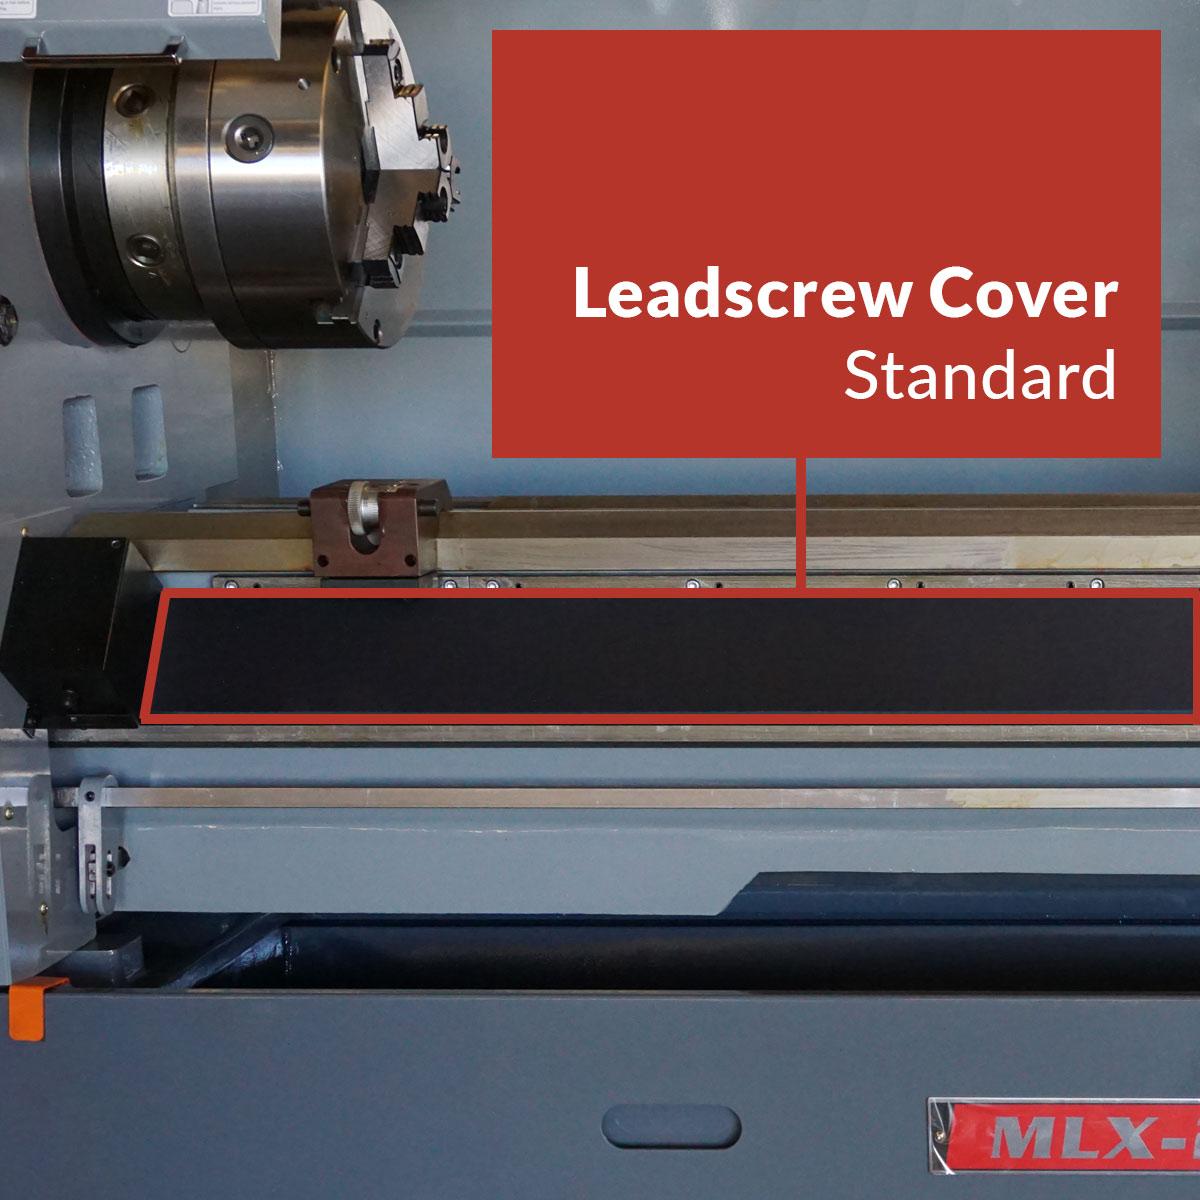 Standard Leadscrew Cover